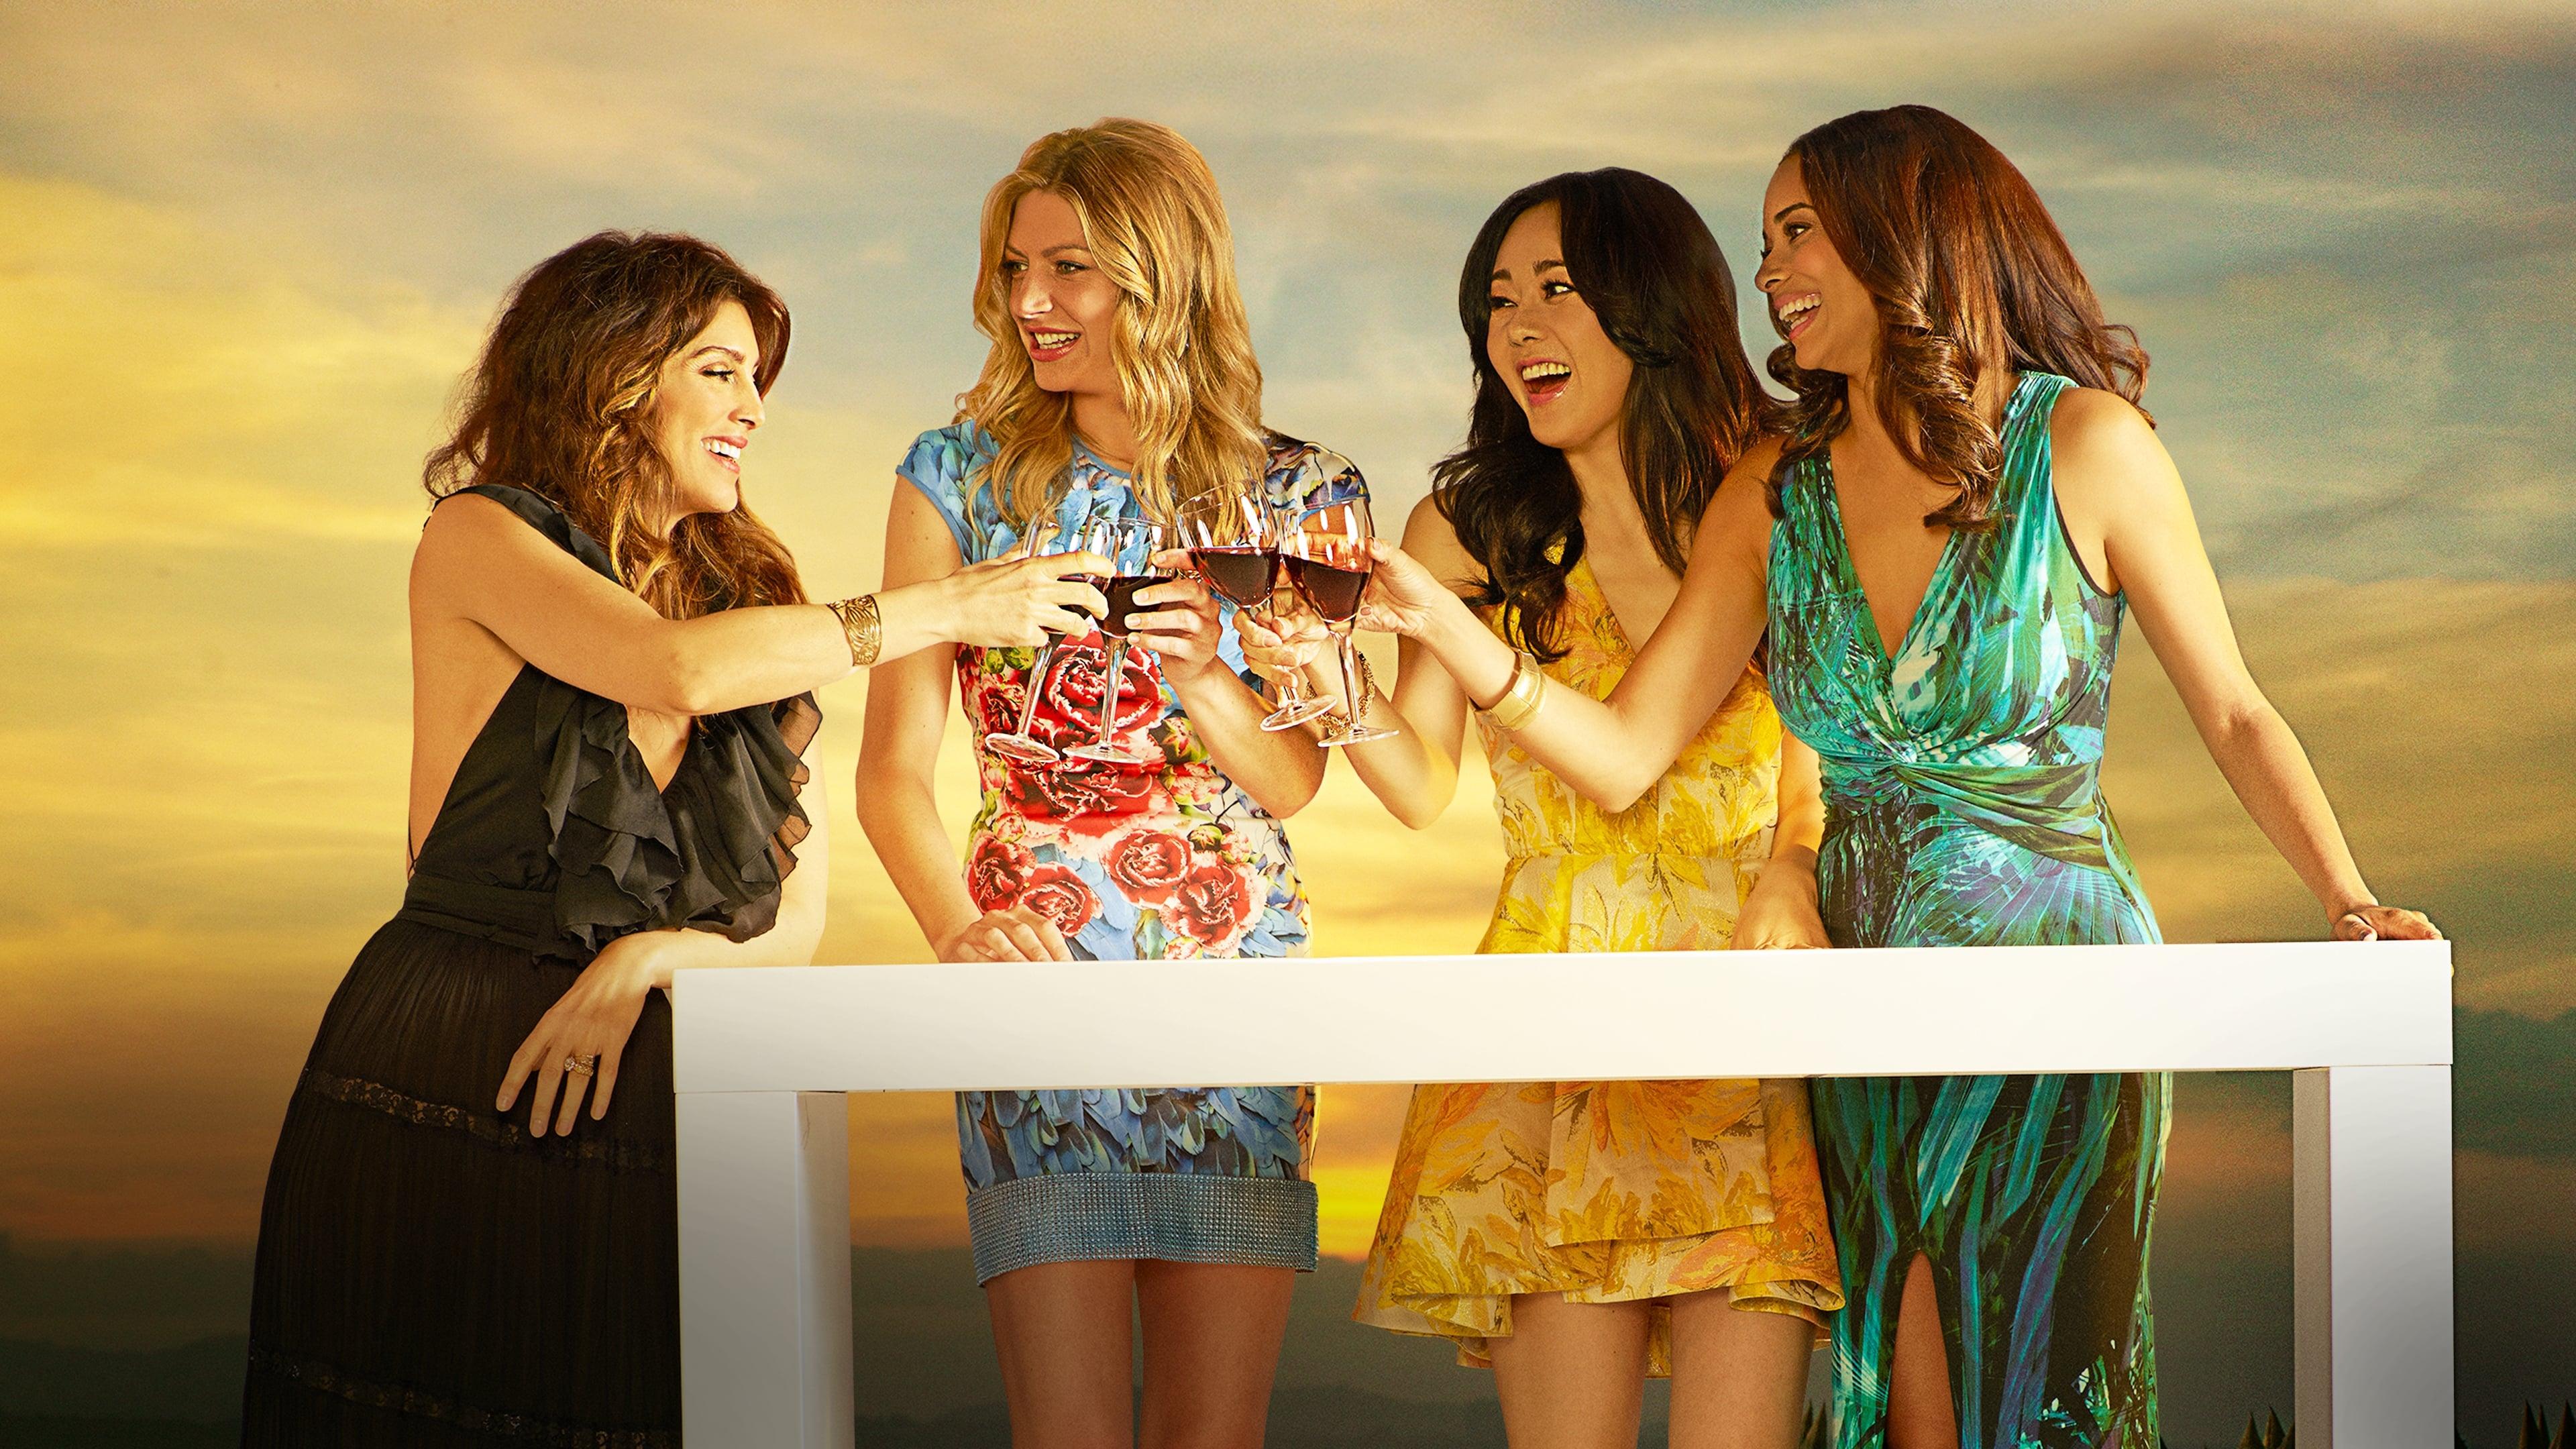 'Mistresses' renewed for season 2